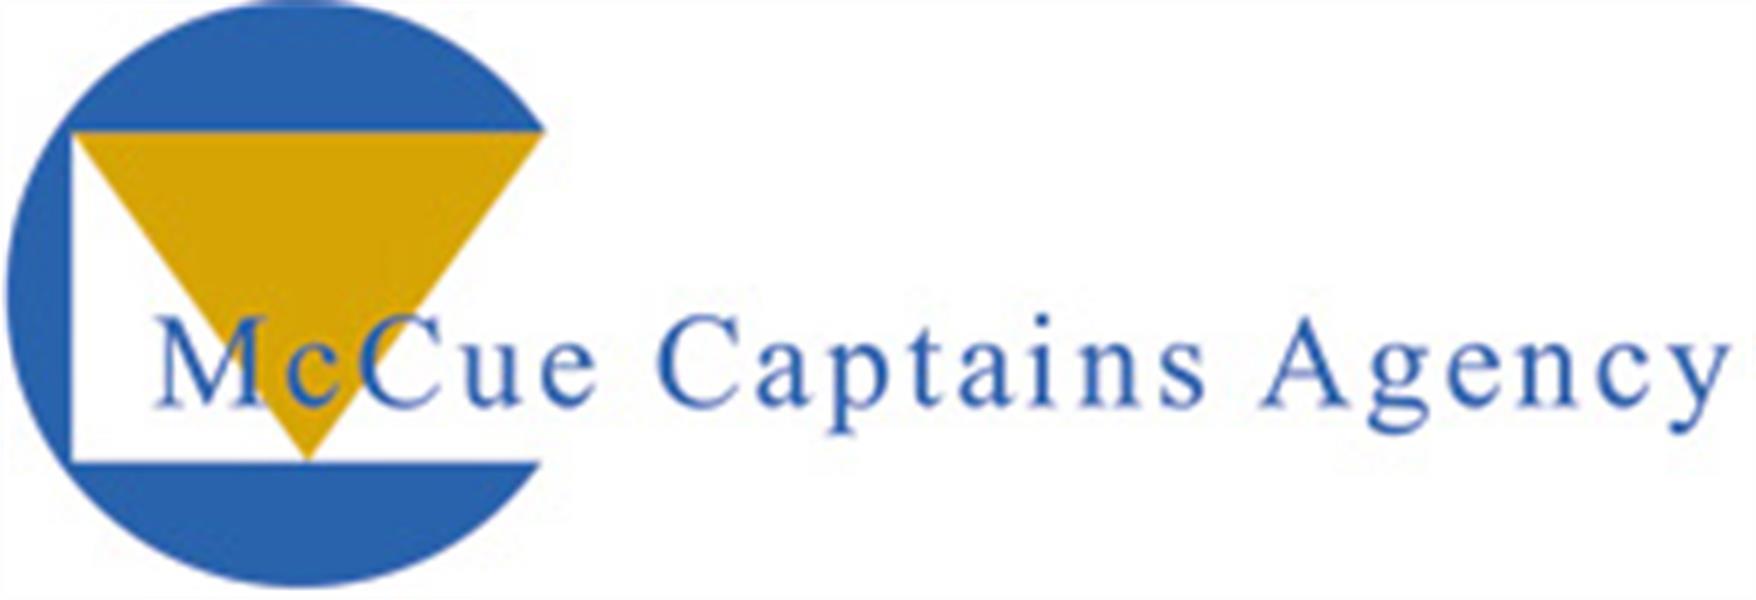 McCue Captains Agency